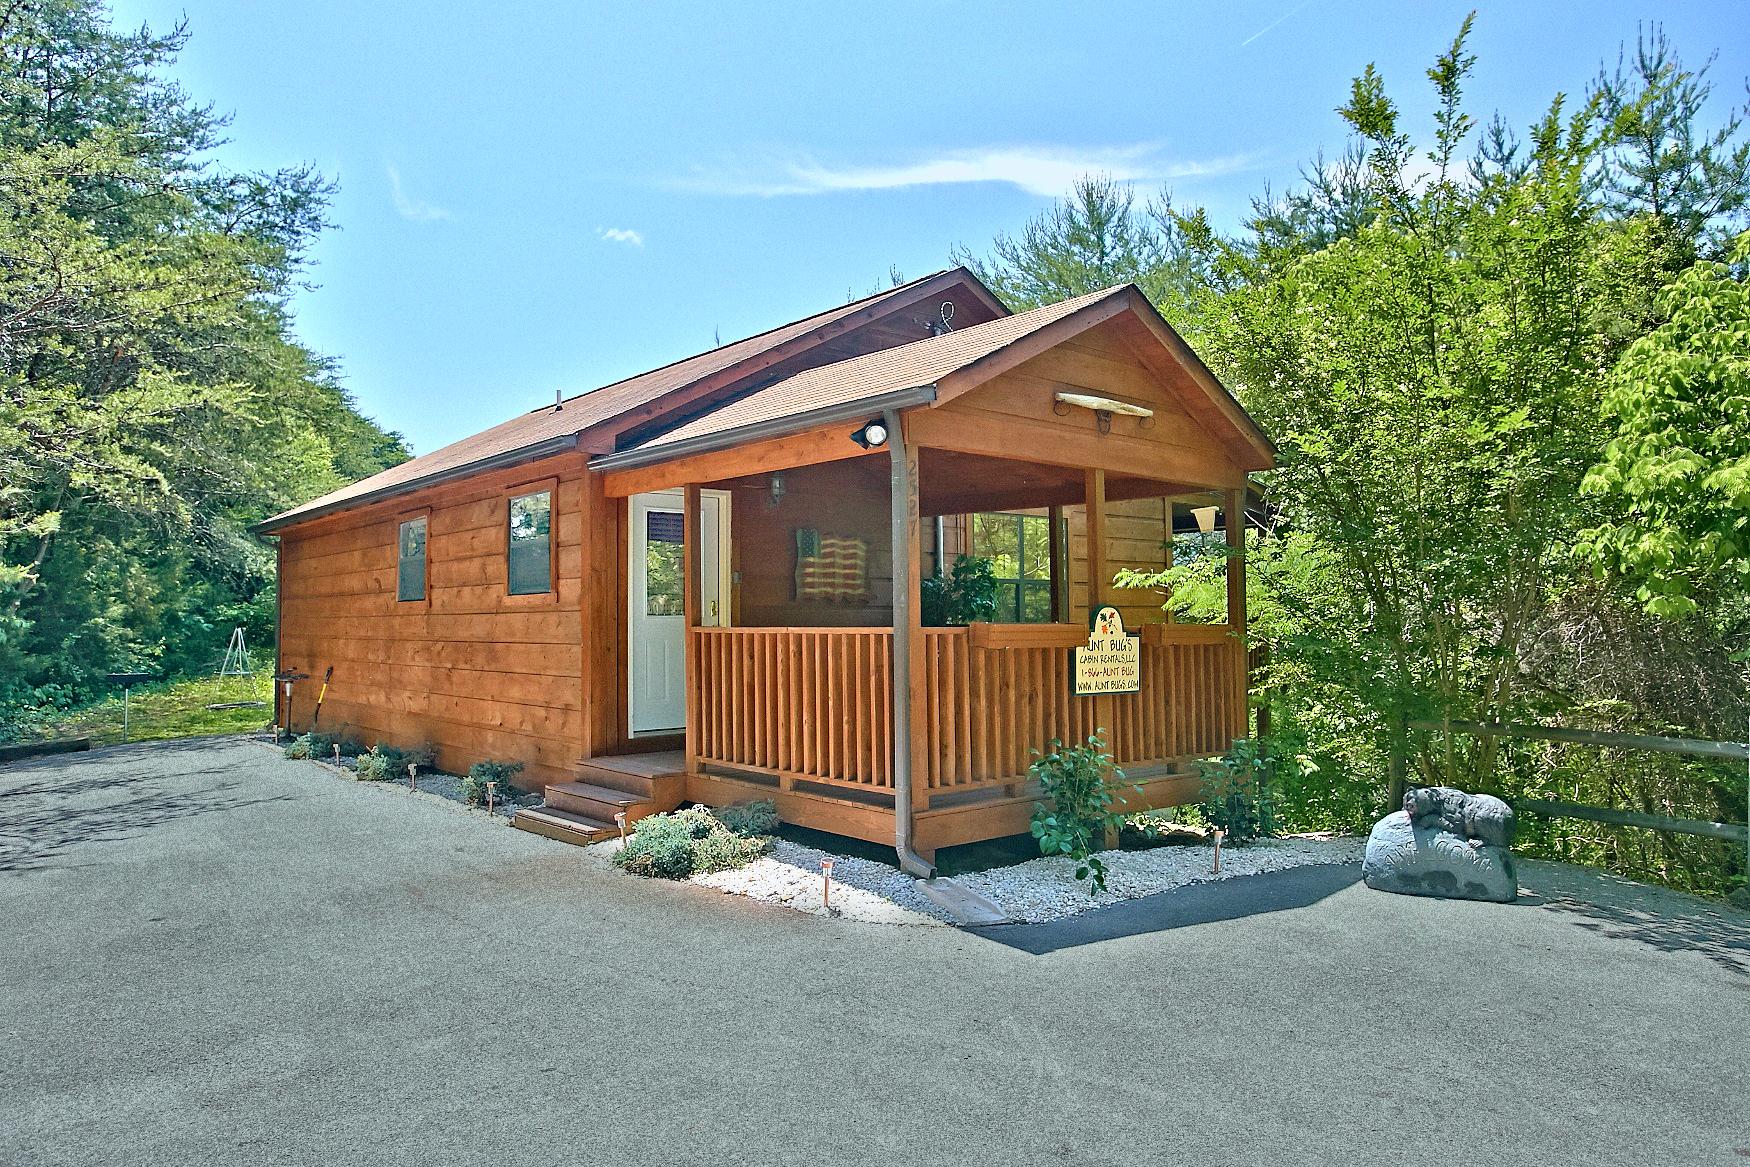 cedar cabin forge one chalet sweet rental dreams pigeon in affordable plus masterbedroomwhirlpool oak loft bedroom luxury estates cabins white deluxe